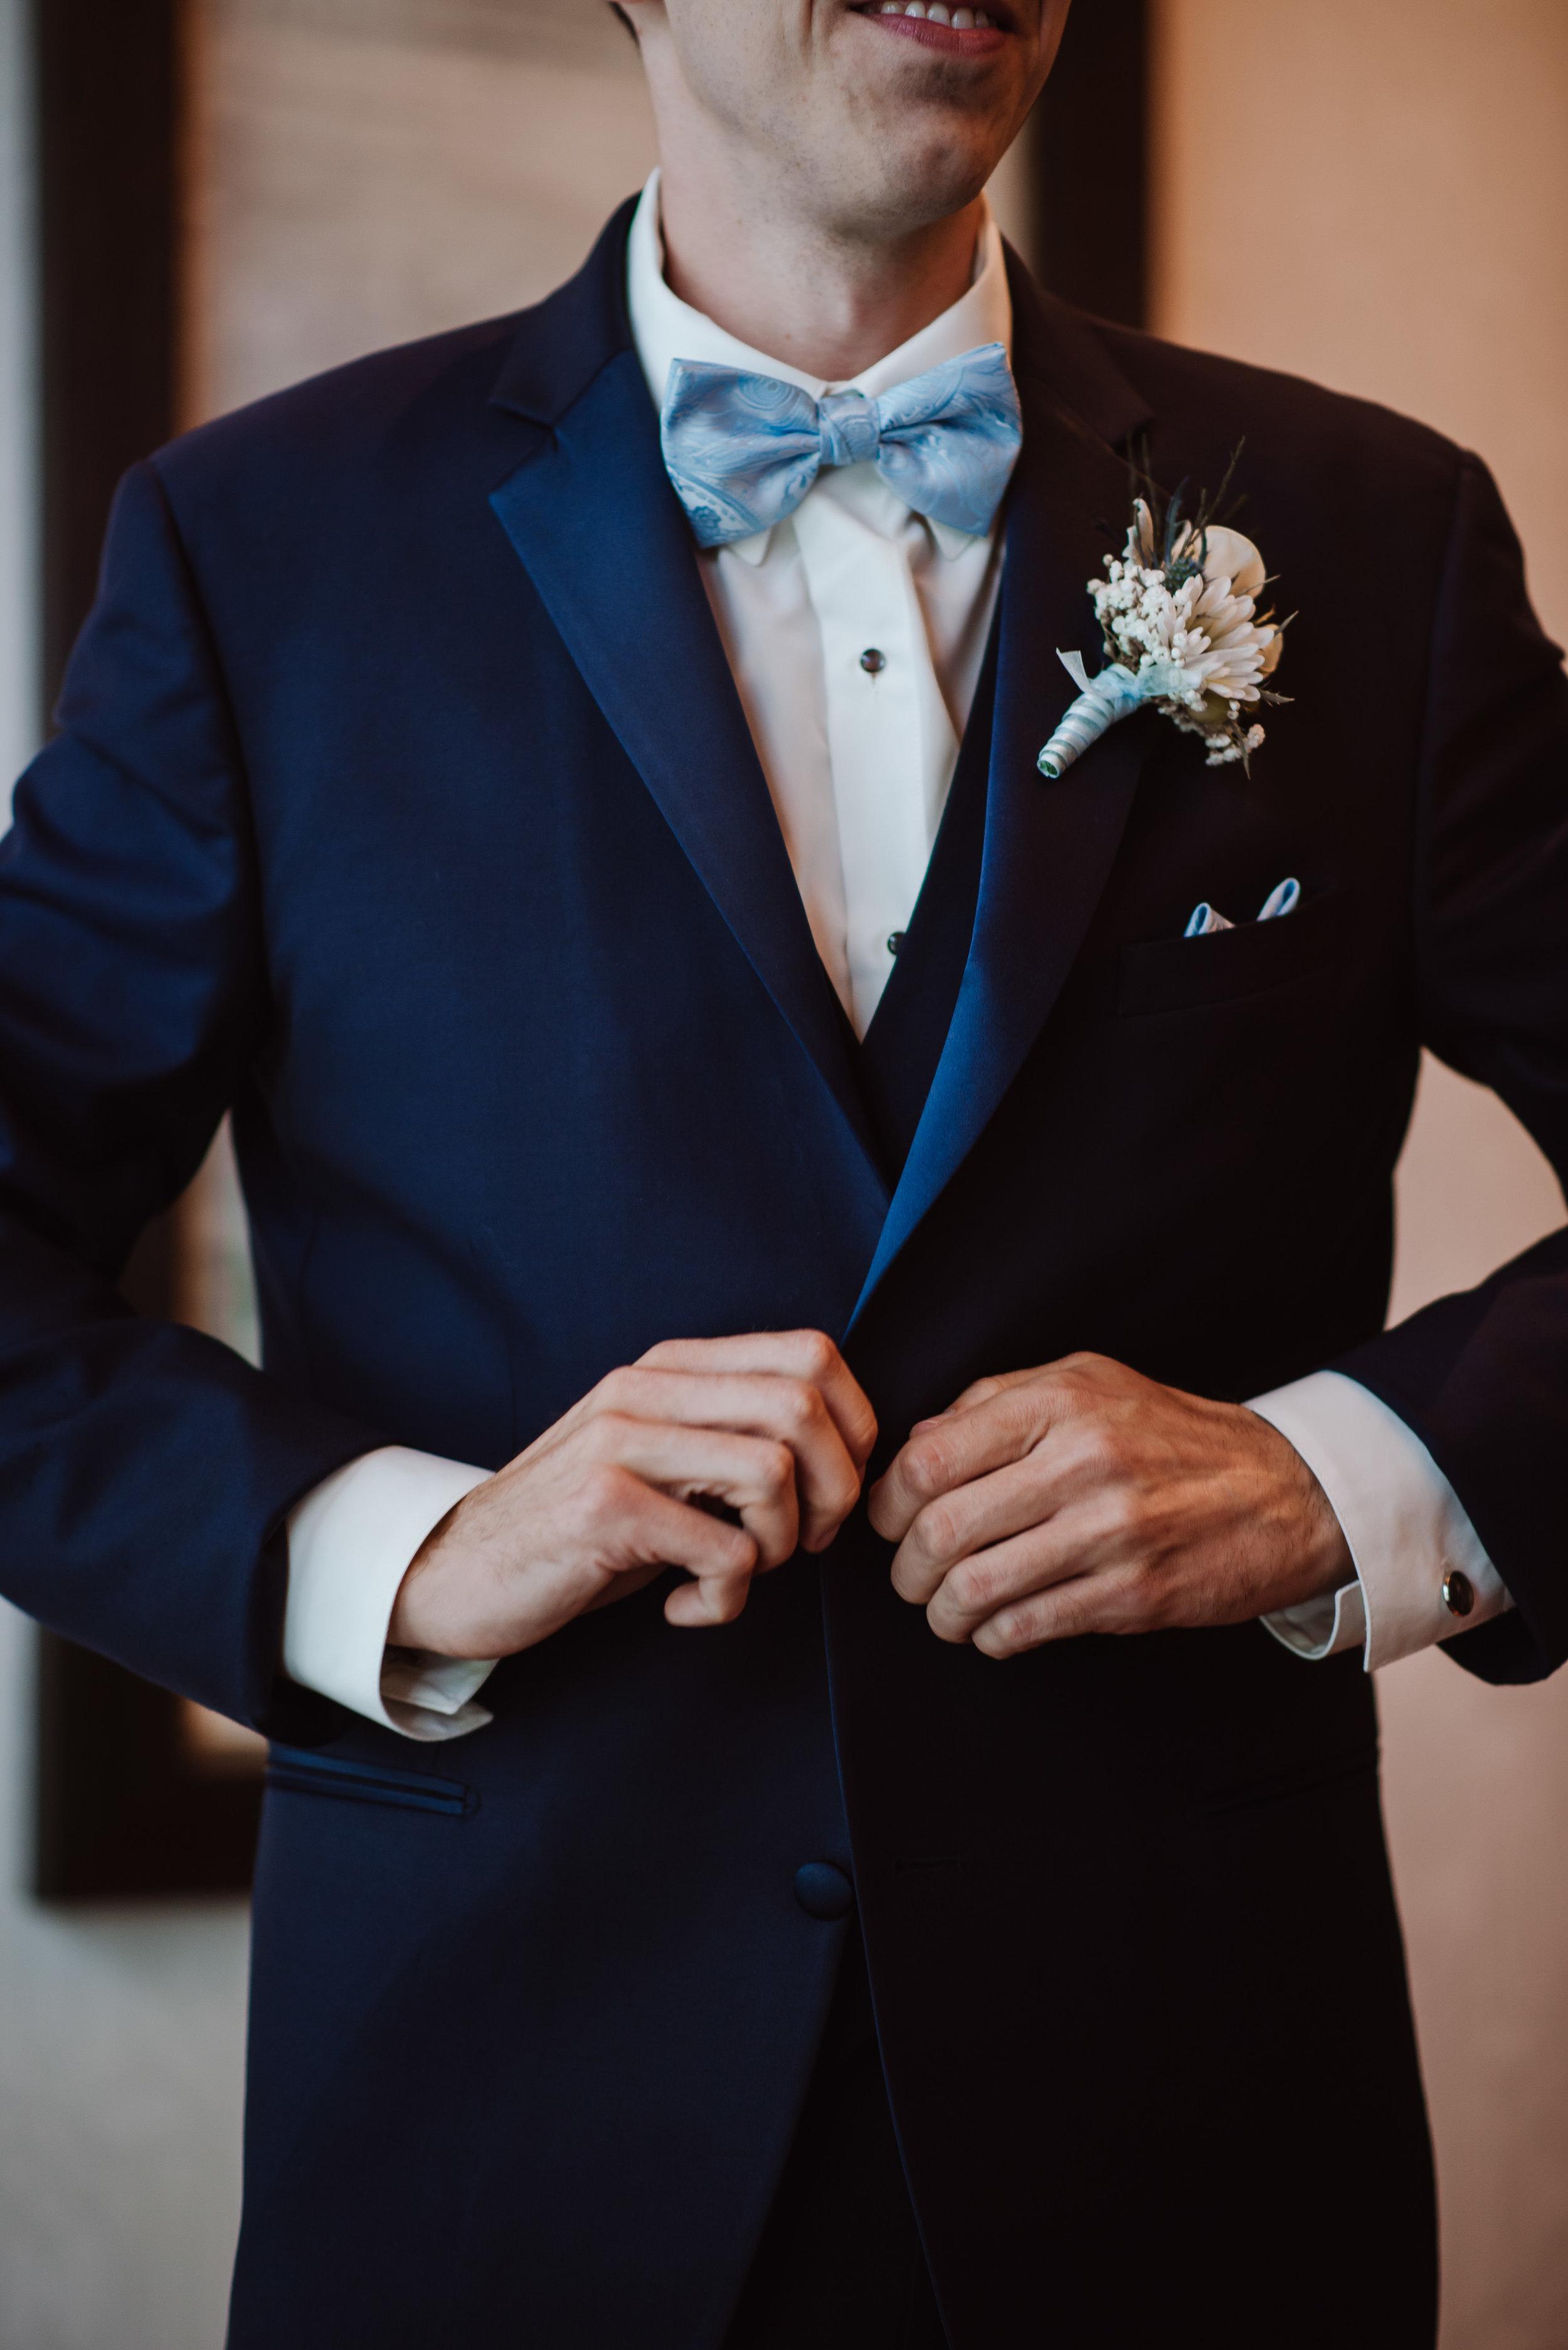 Groom getting ready at High Point, NC wedding venue by Kayli LaFon Photography